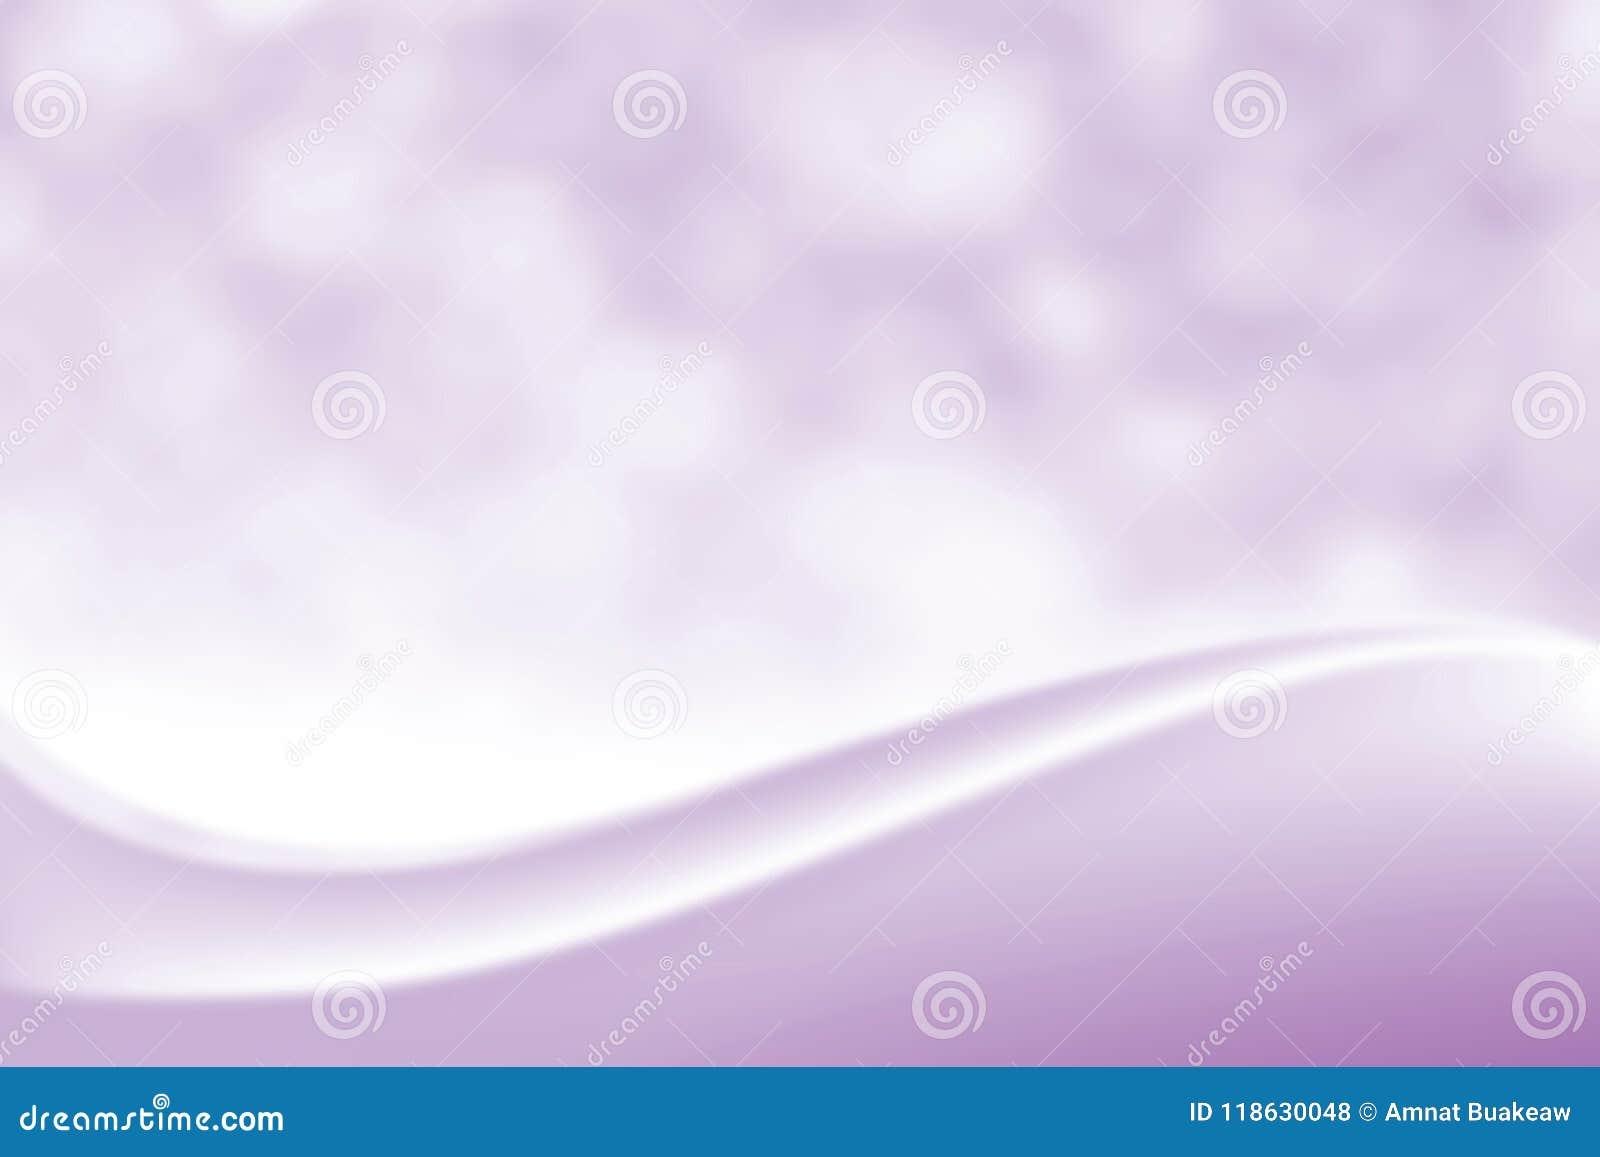 Fondo suave elegante púrpura liso borroso de la belleza, sombra cosmética lujosa de la luz suave de Bokeh del contexto, tono del